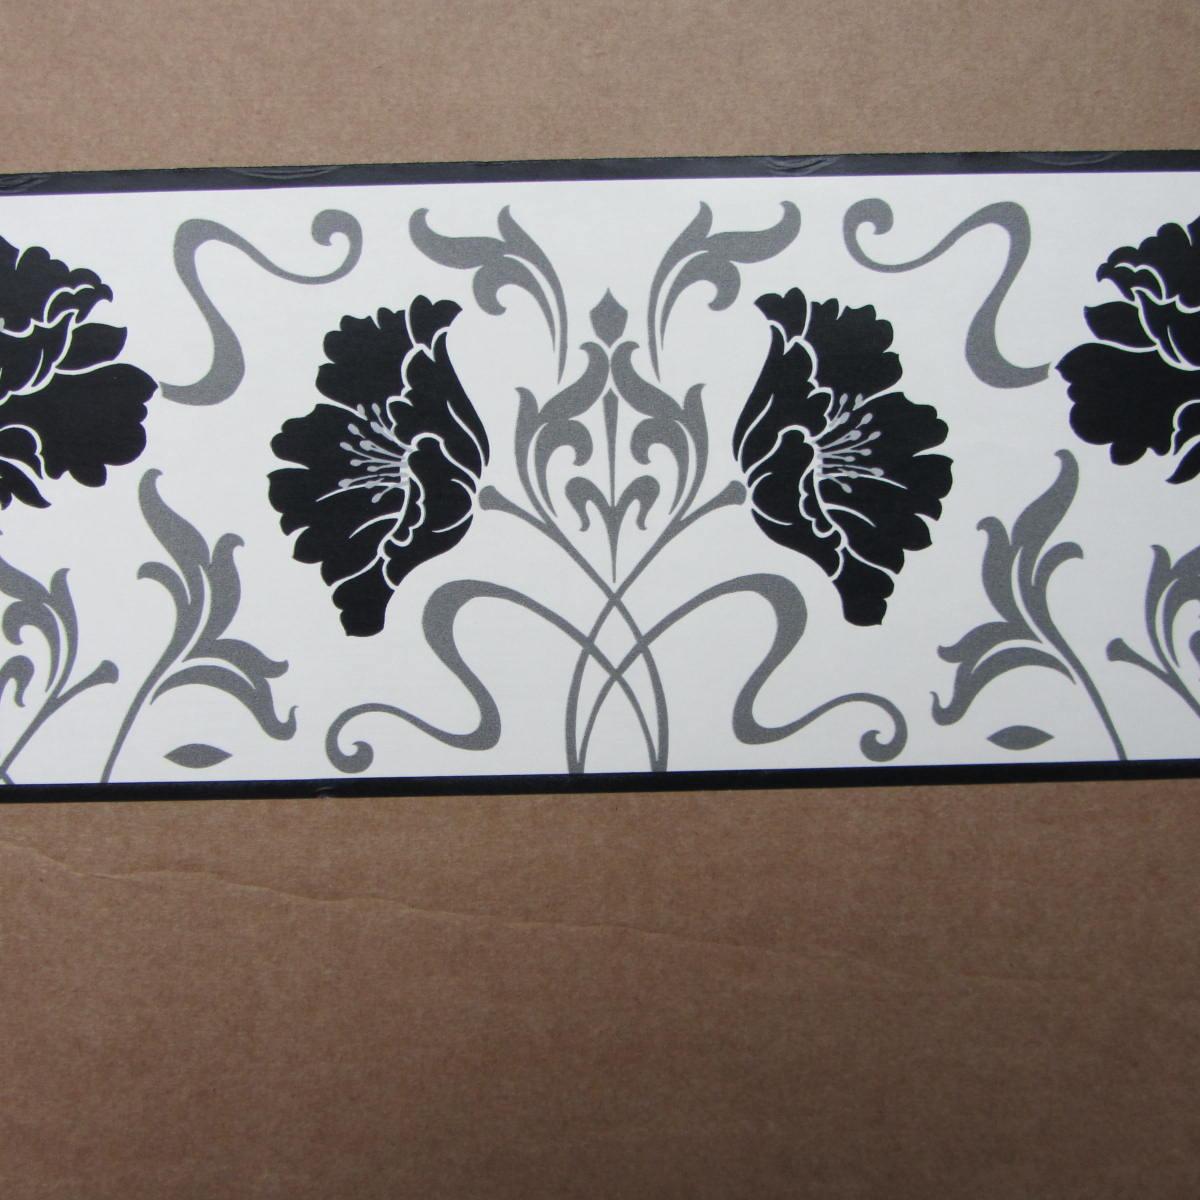 Free Download About Modern Floral Damask Black White